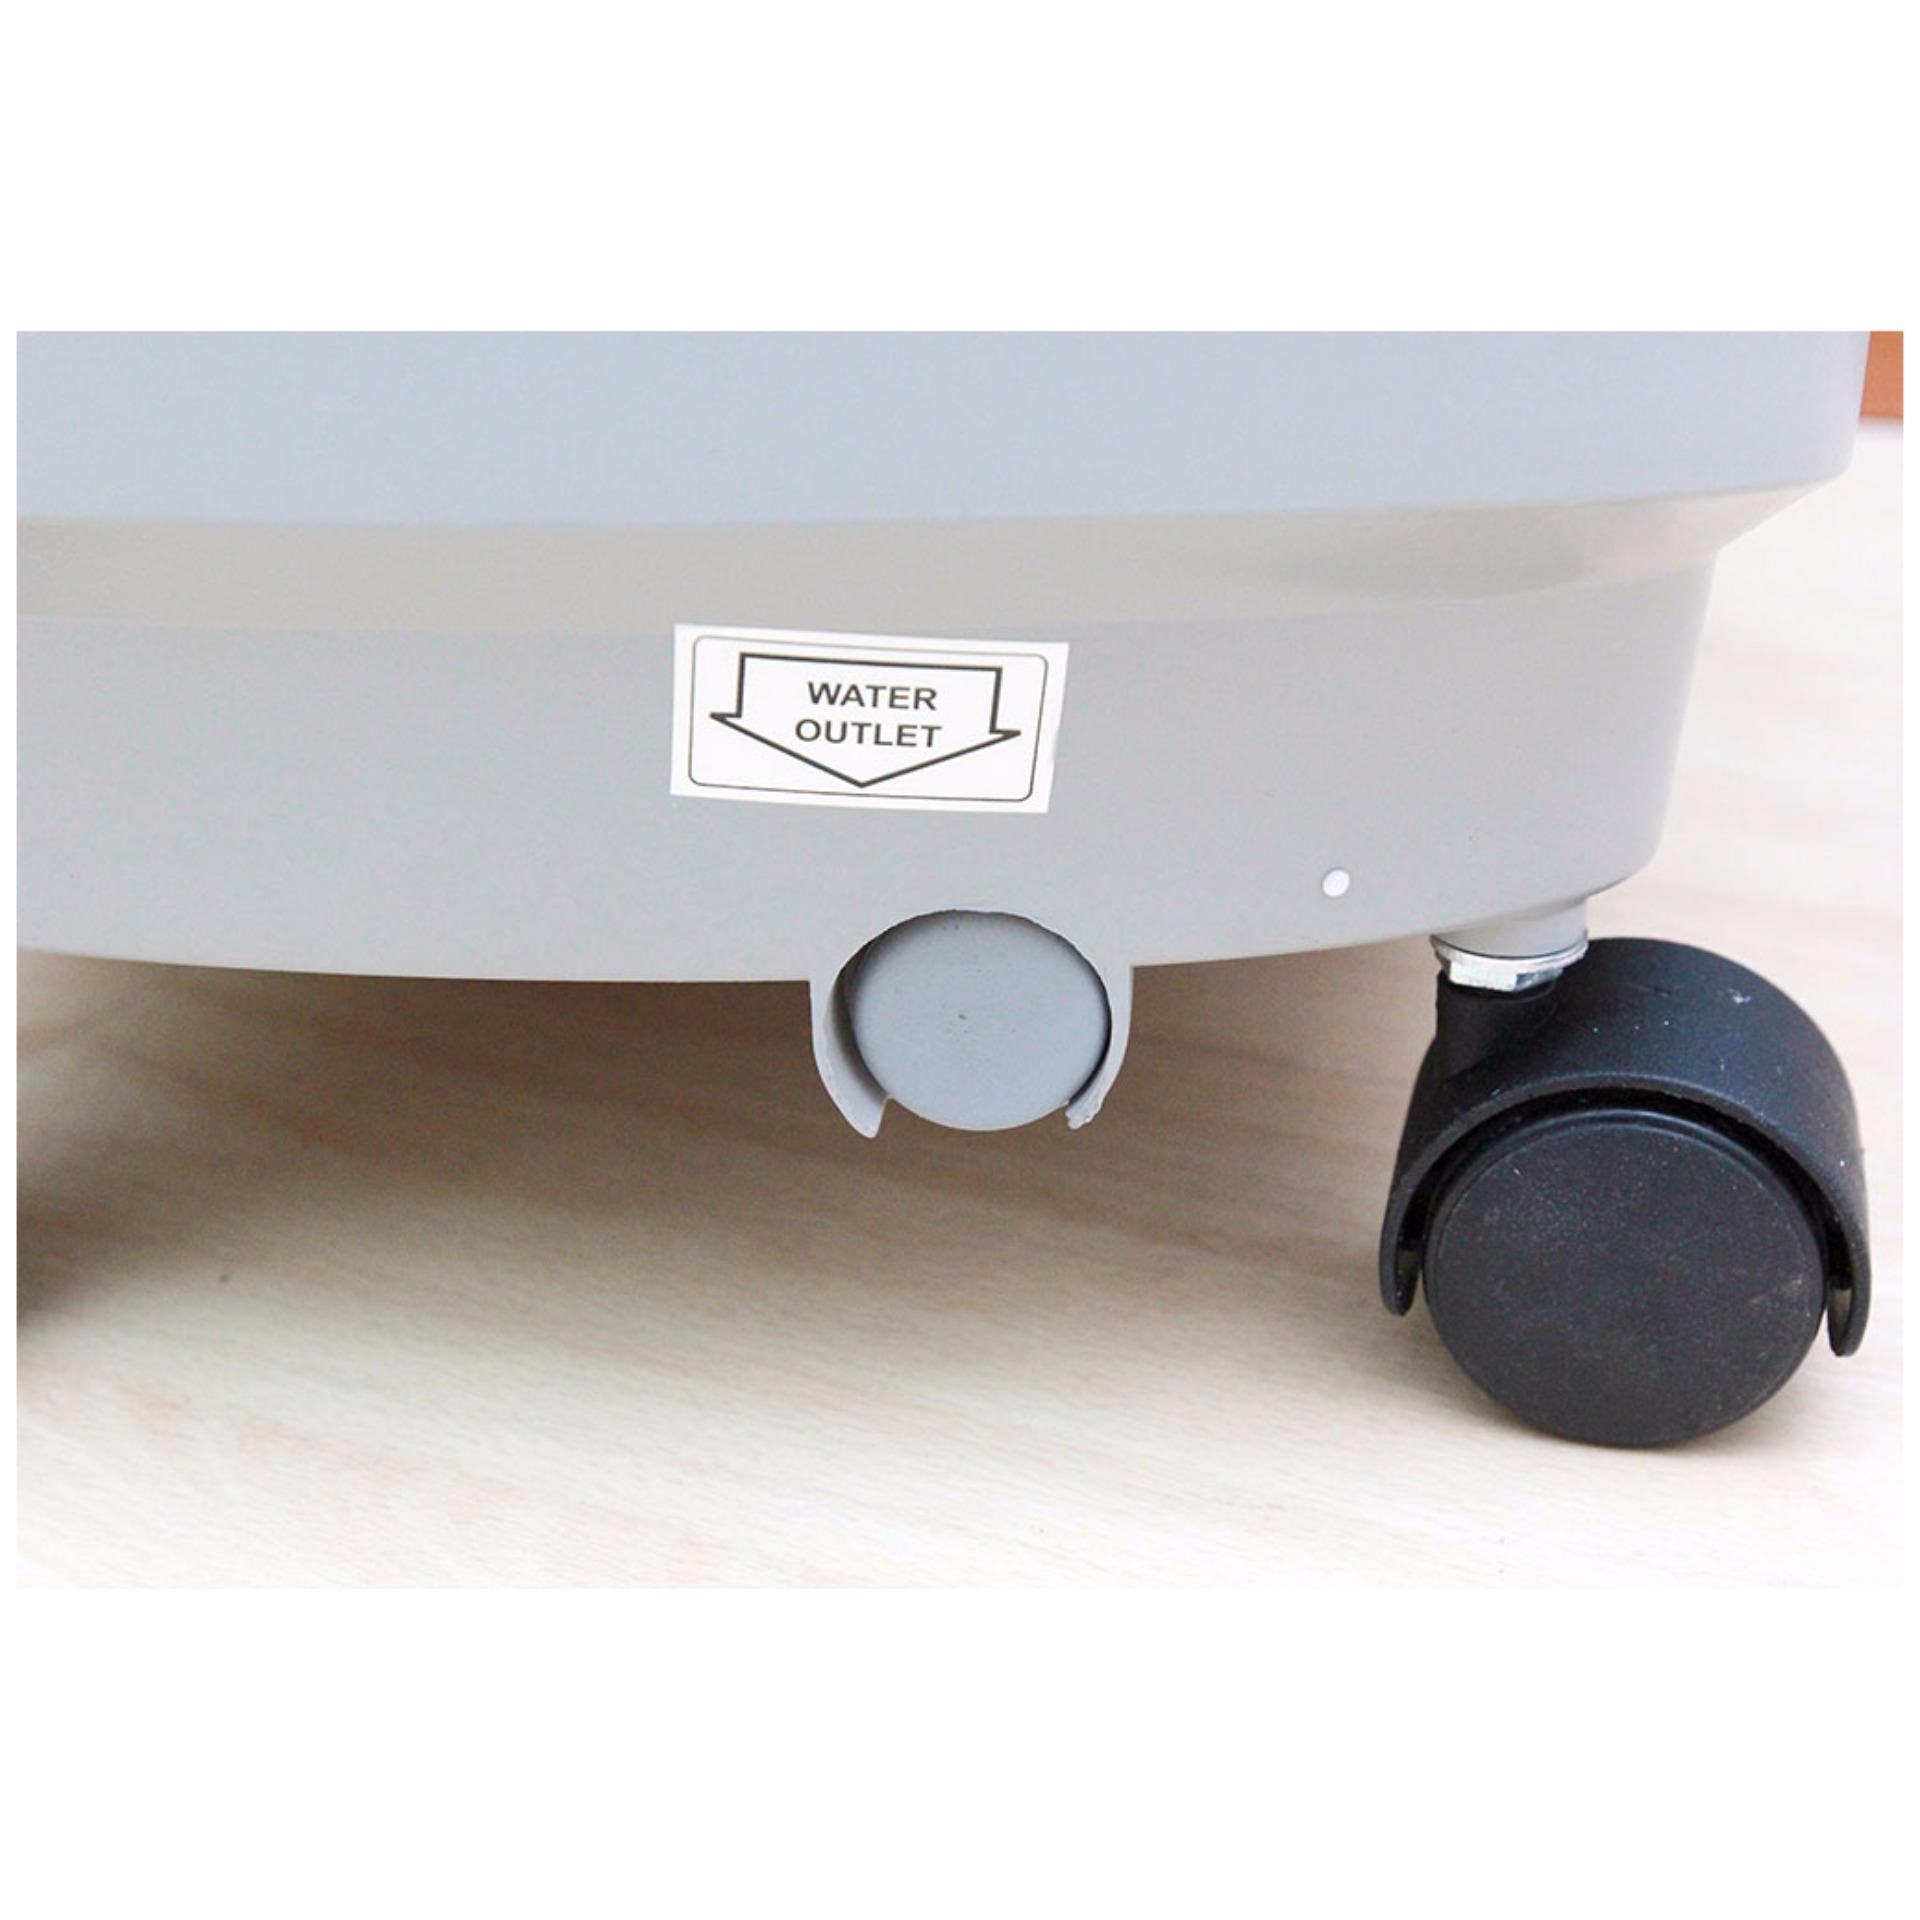 Quạt hơi nước AQUA AREF- B100MK3A 4.5L (Trắng)